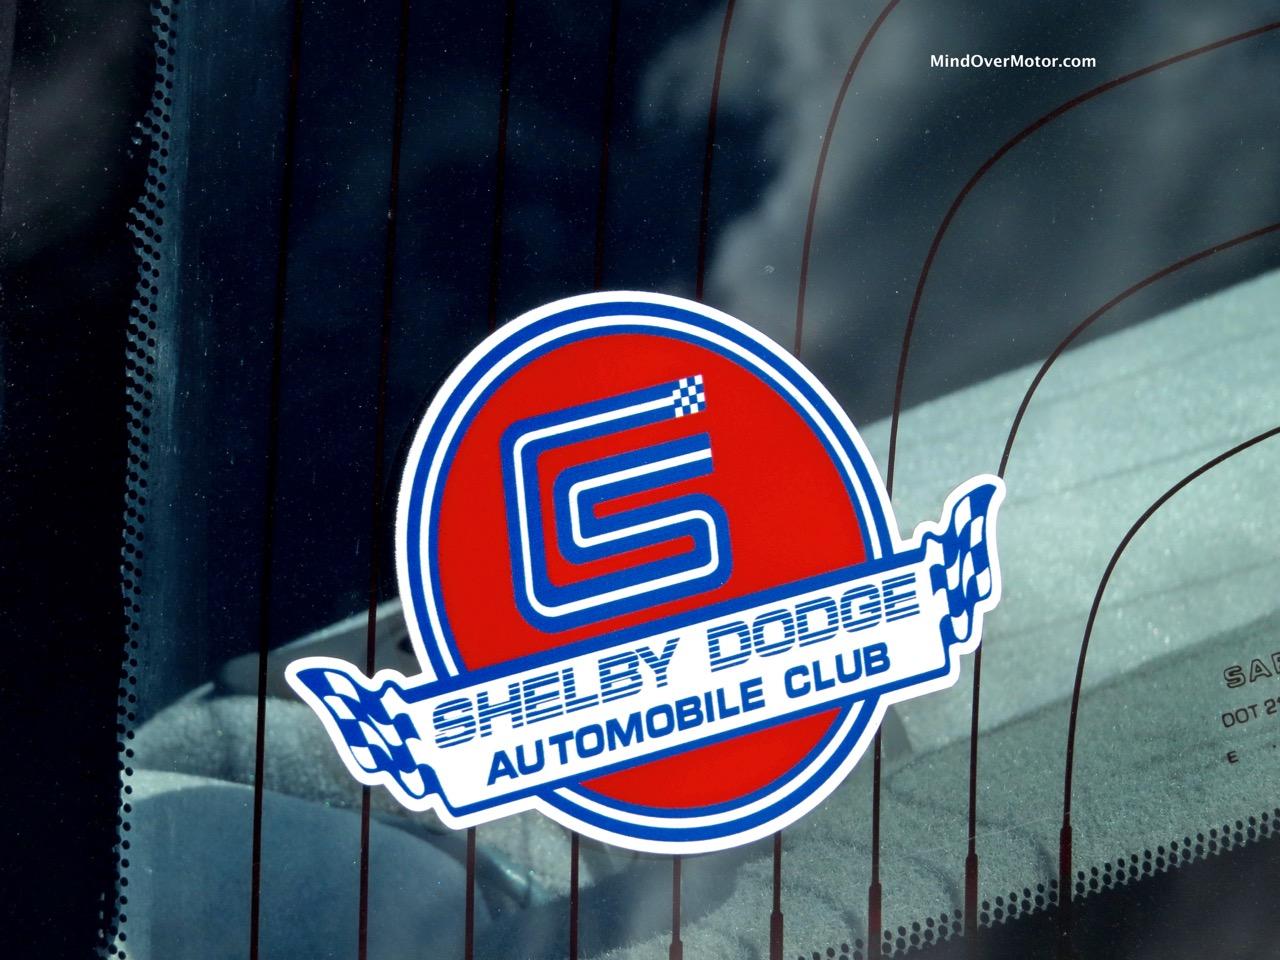 1991 Dodge Spirit R:T Shelby Label